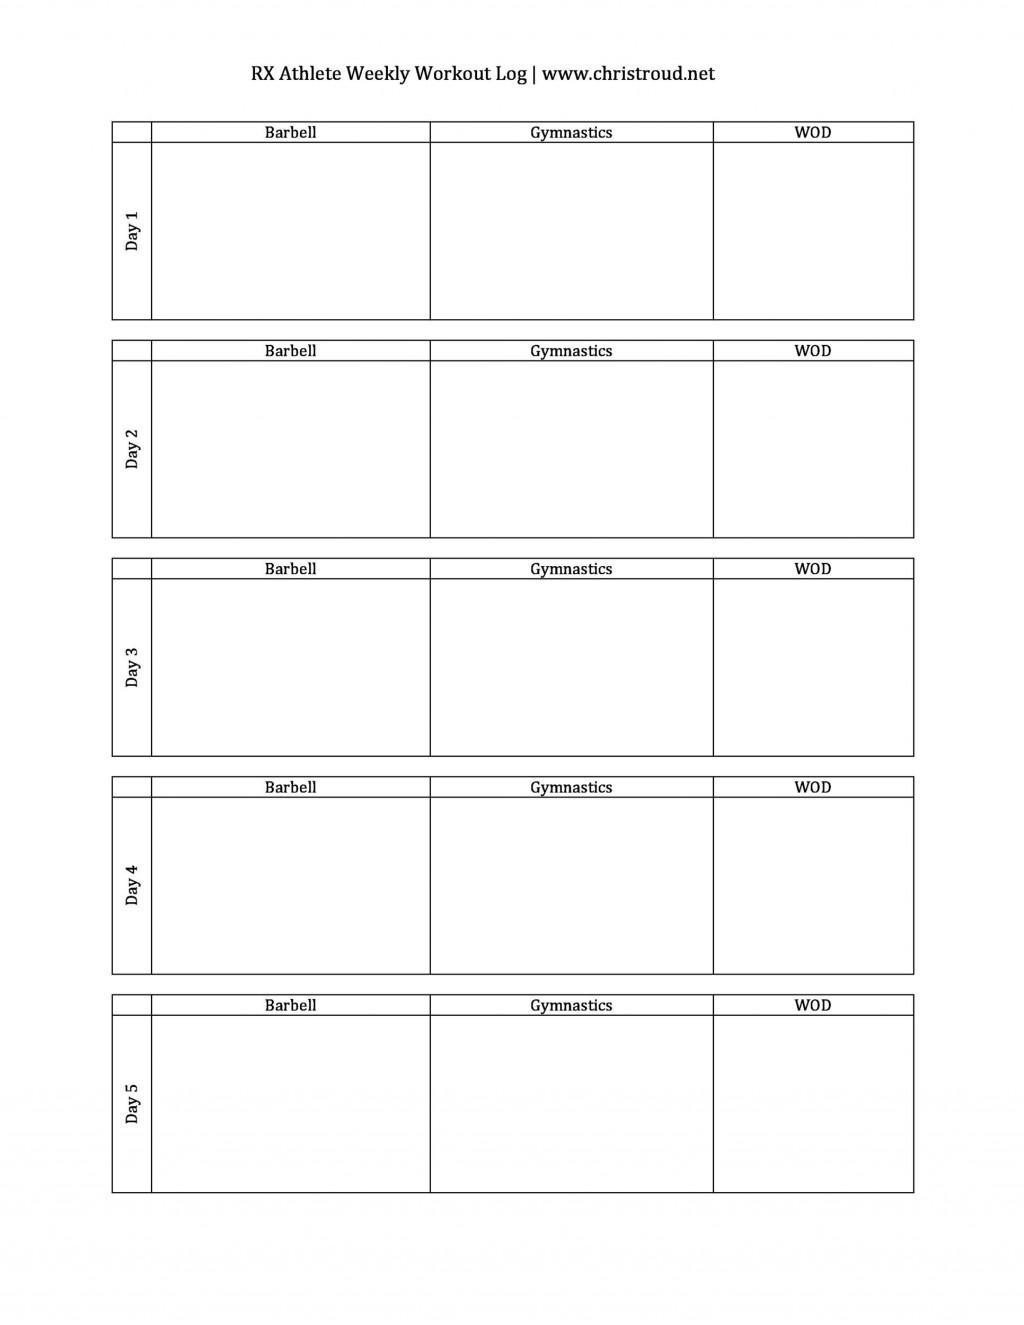 008 Marvelou Weekly Workout Schedule Template Idea  12 Week Plan Training CalendarLarge